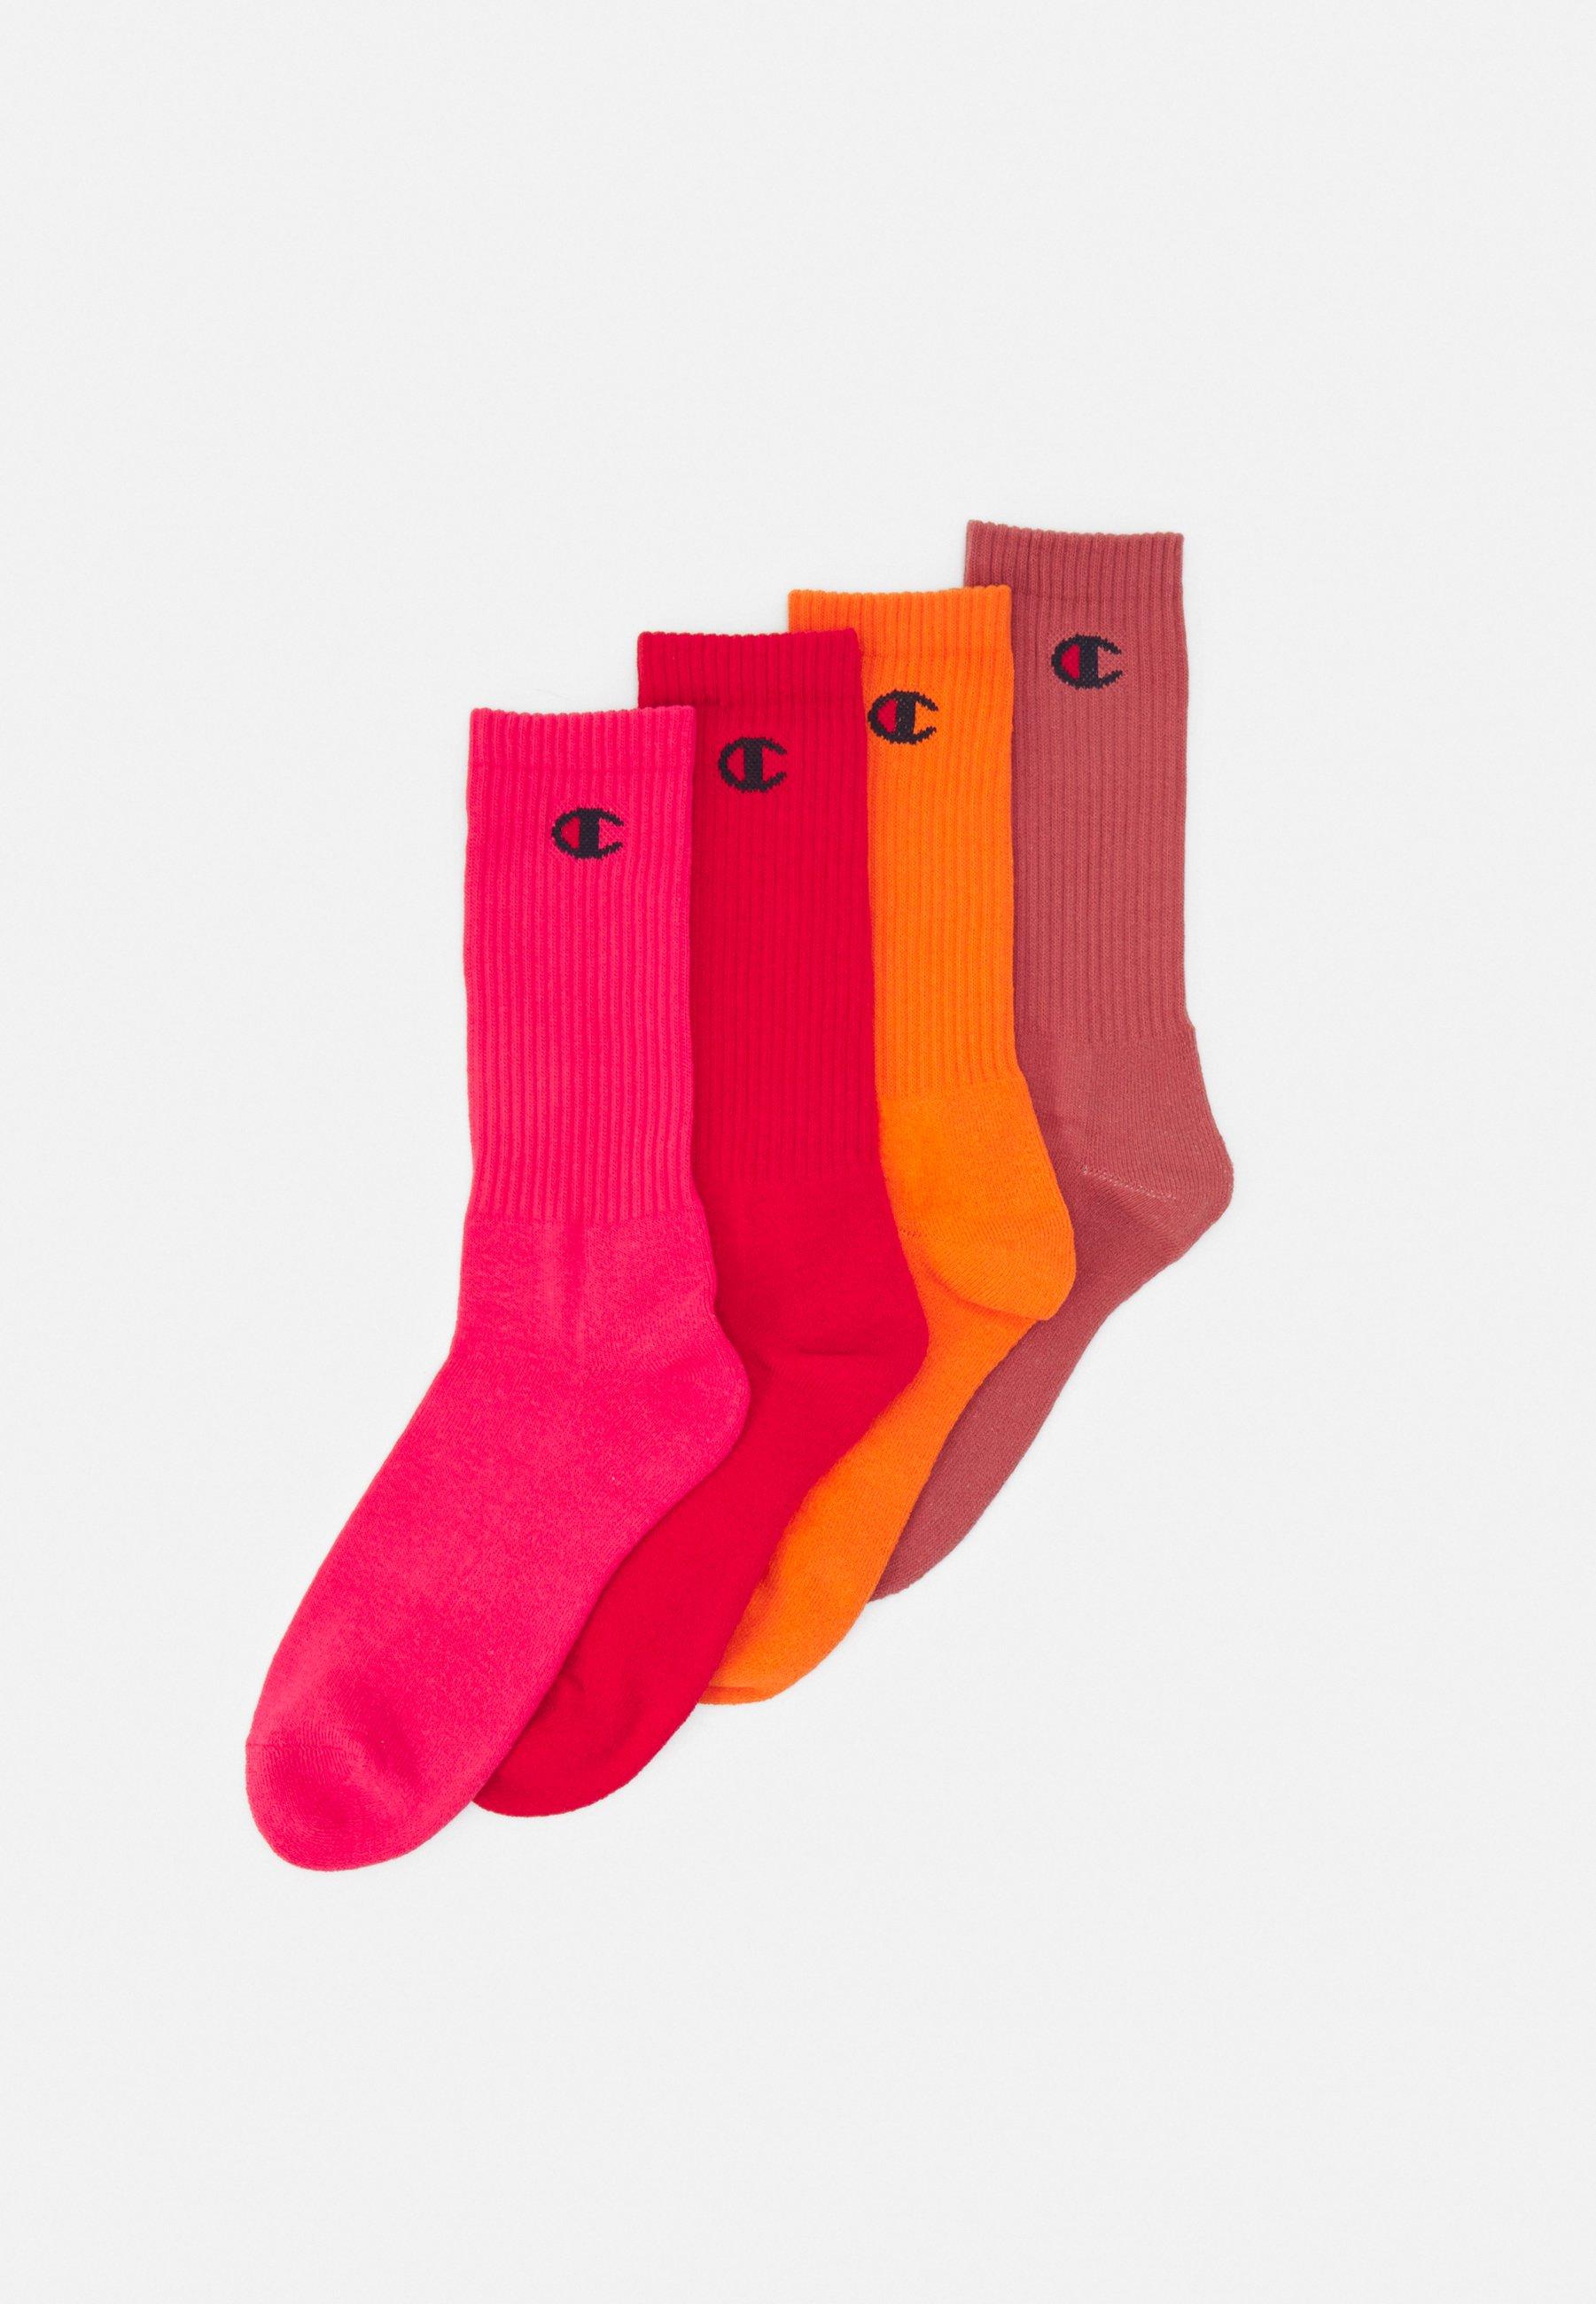 Donna PASTEL CREW SOCKS 4 PACK UNISEX - Calze sportive